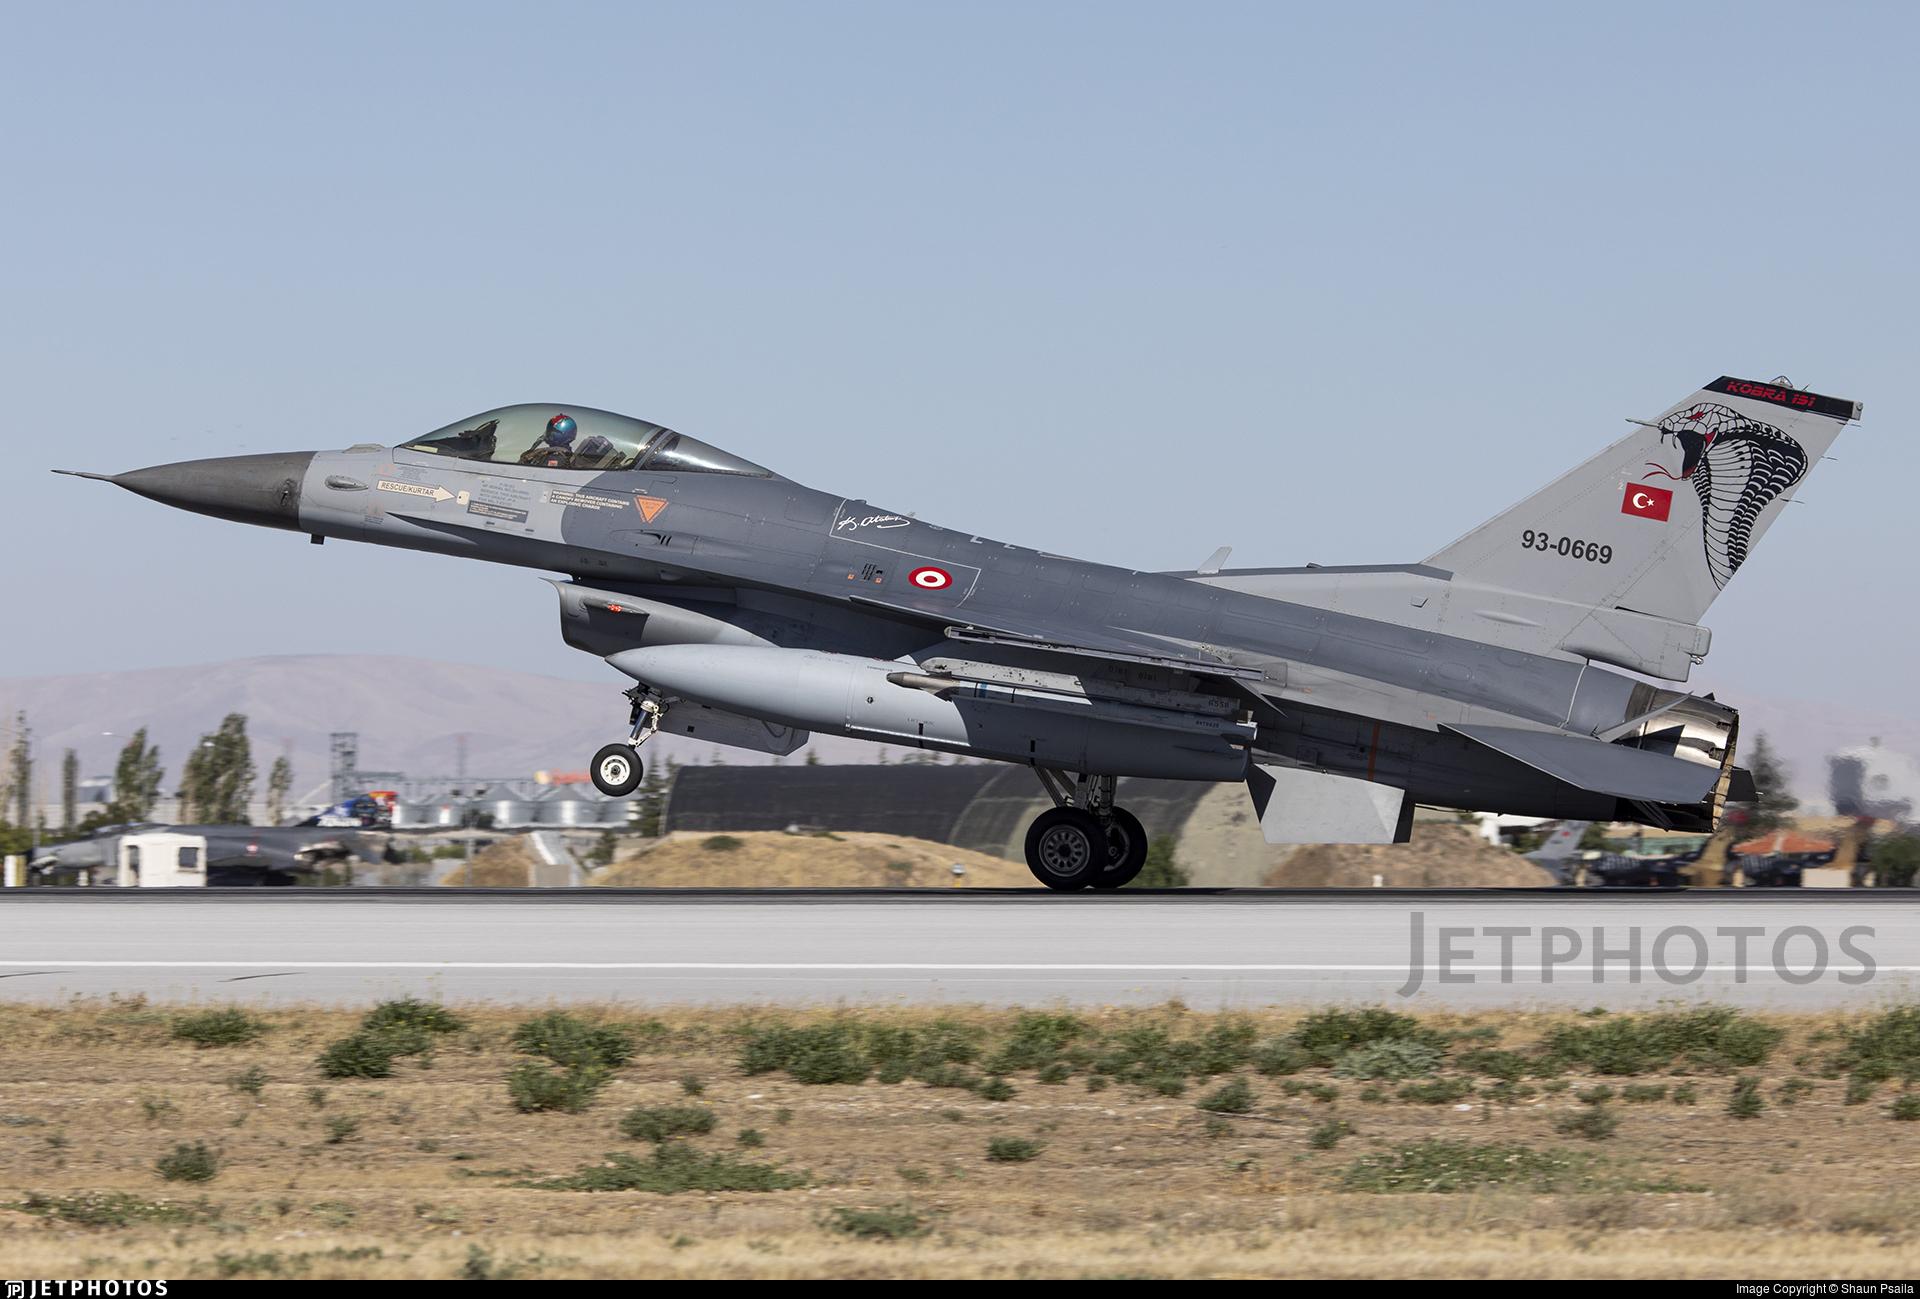 93-0669 - General Dynamics F-16C Fighting Falcon - Turkey - Air Force